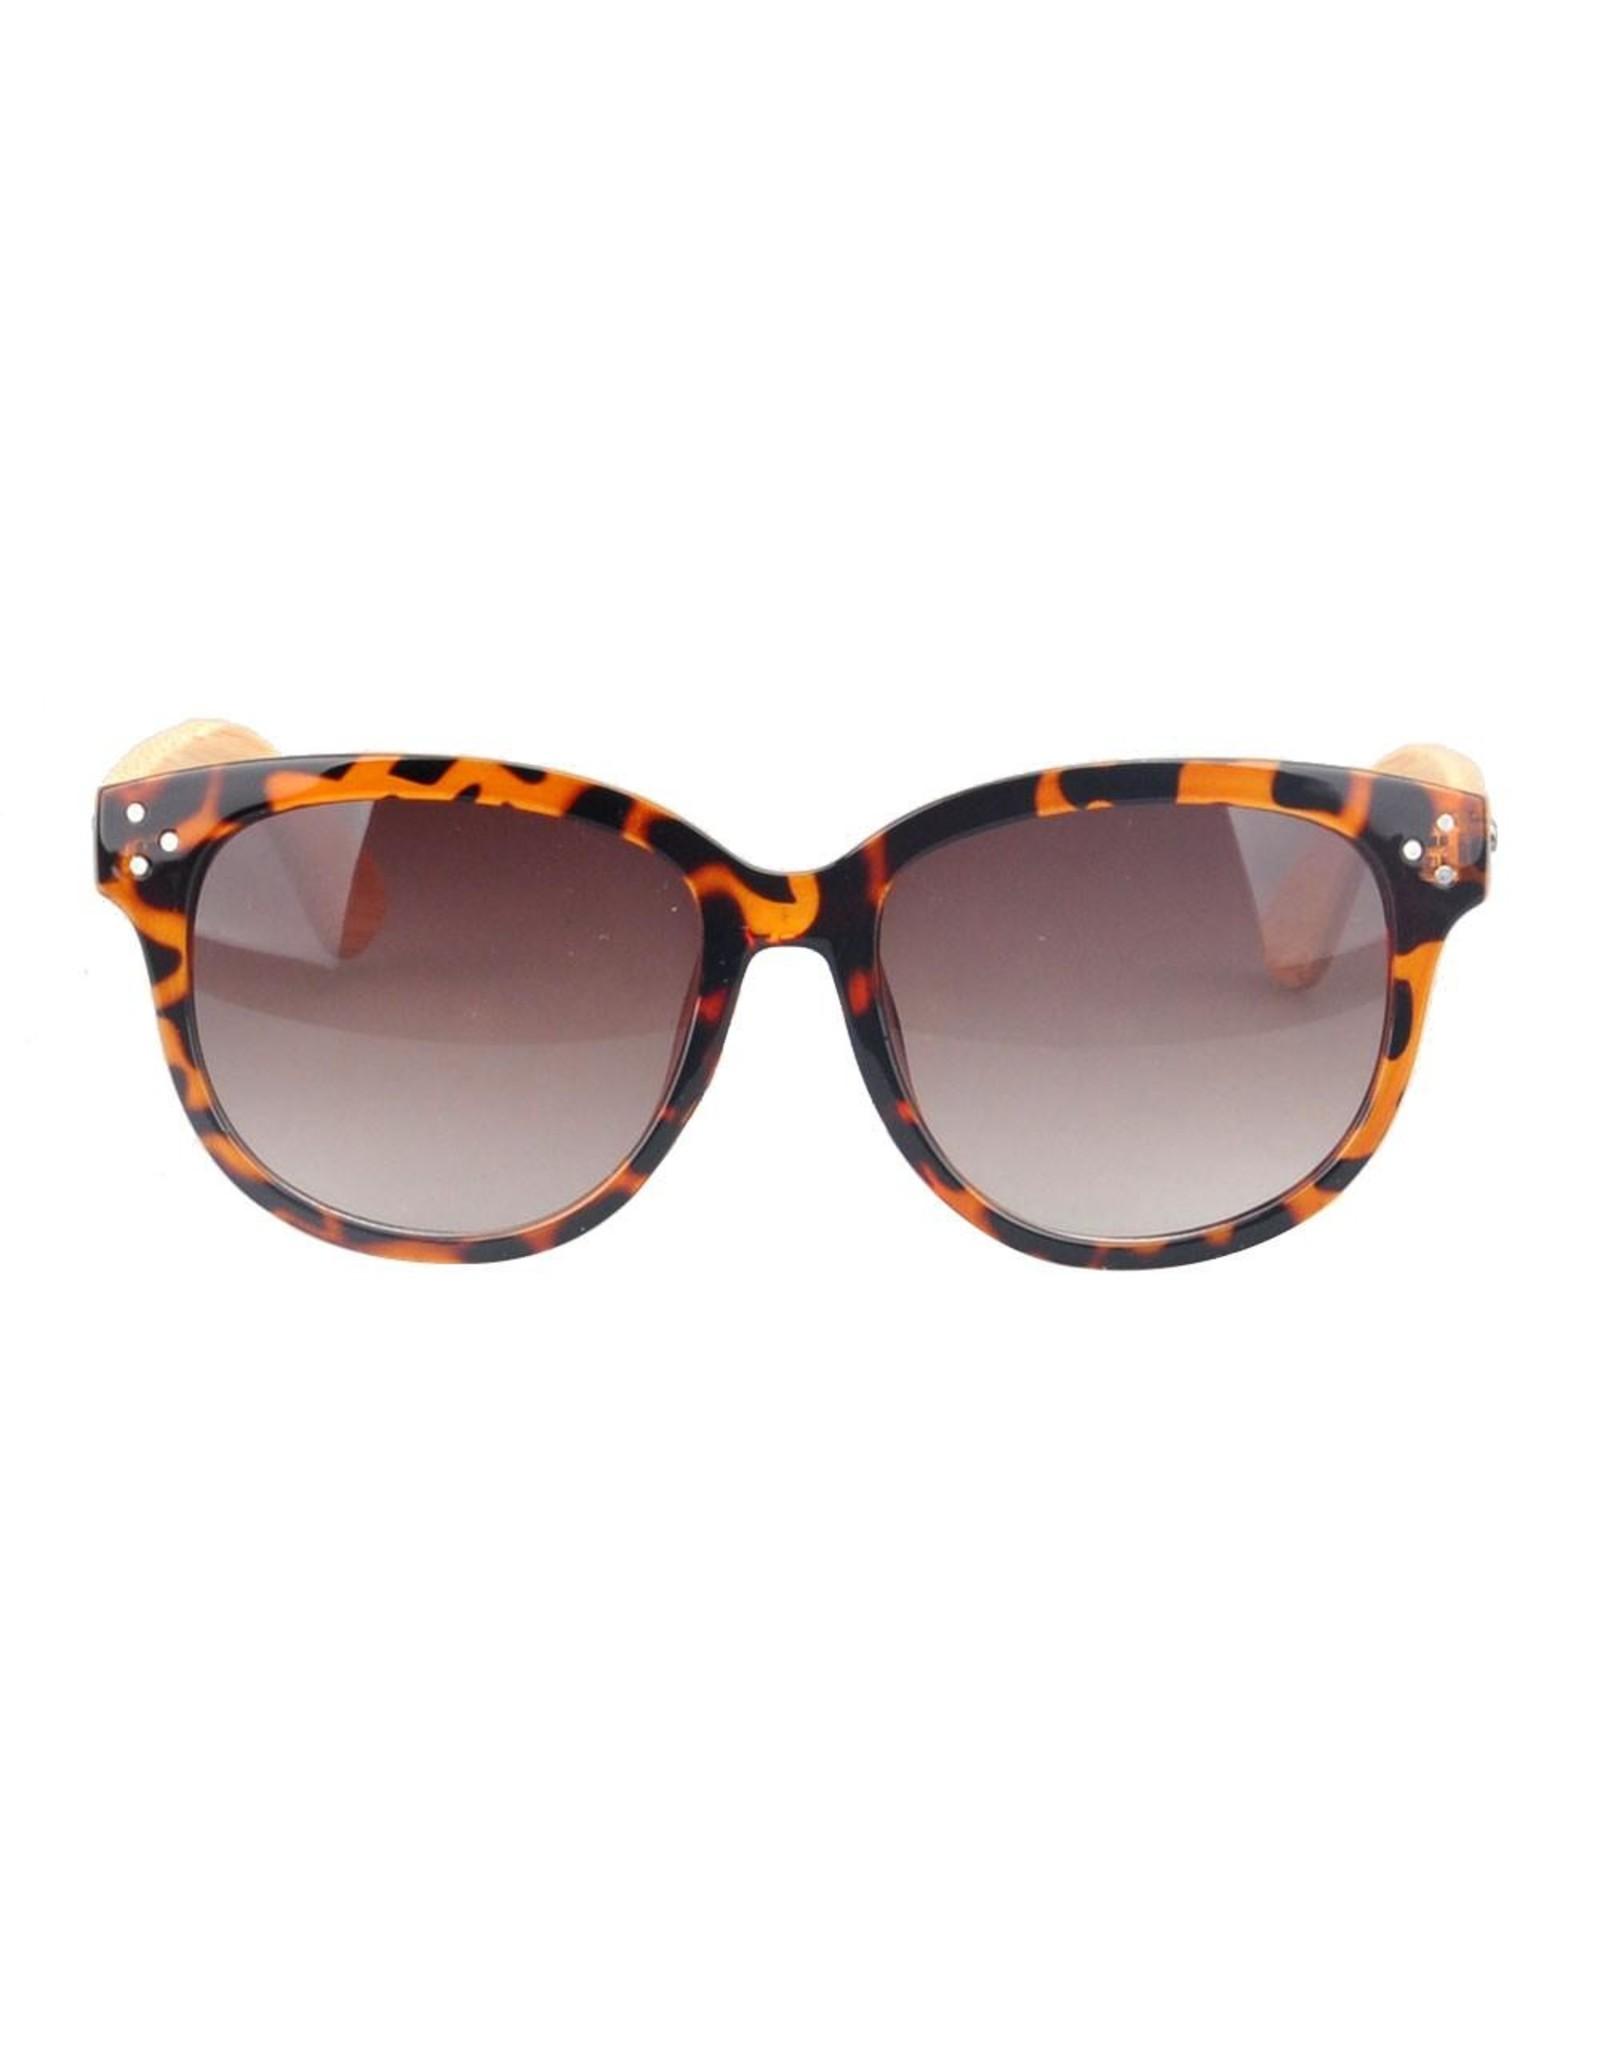 Kuma Eyewear - Mallee Sunglasses - Tortoise